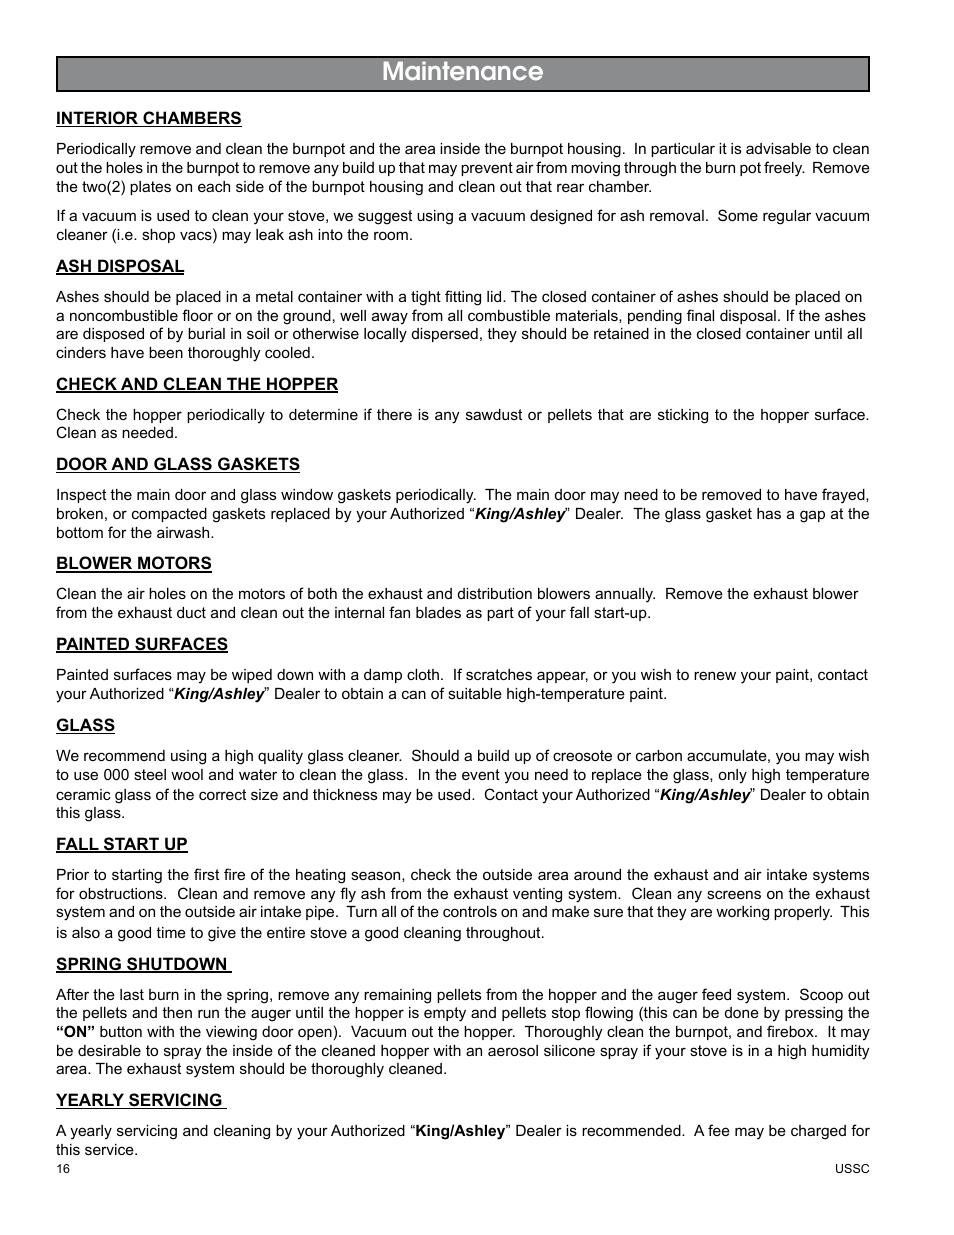 maintenance united states stove company king ashley pellet stove rh manualsdir com Kenmore Stove Manual Frigidaire Electric Stove and Ovens